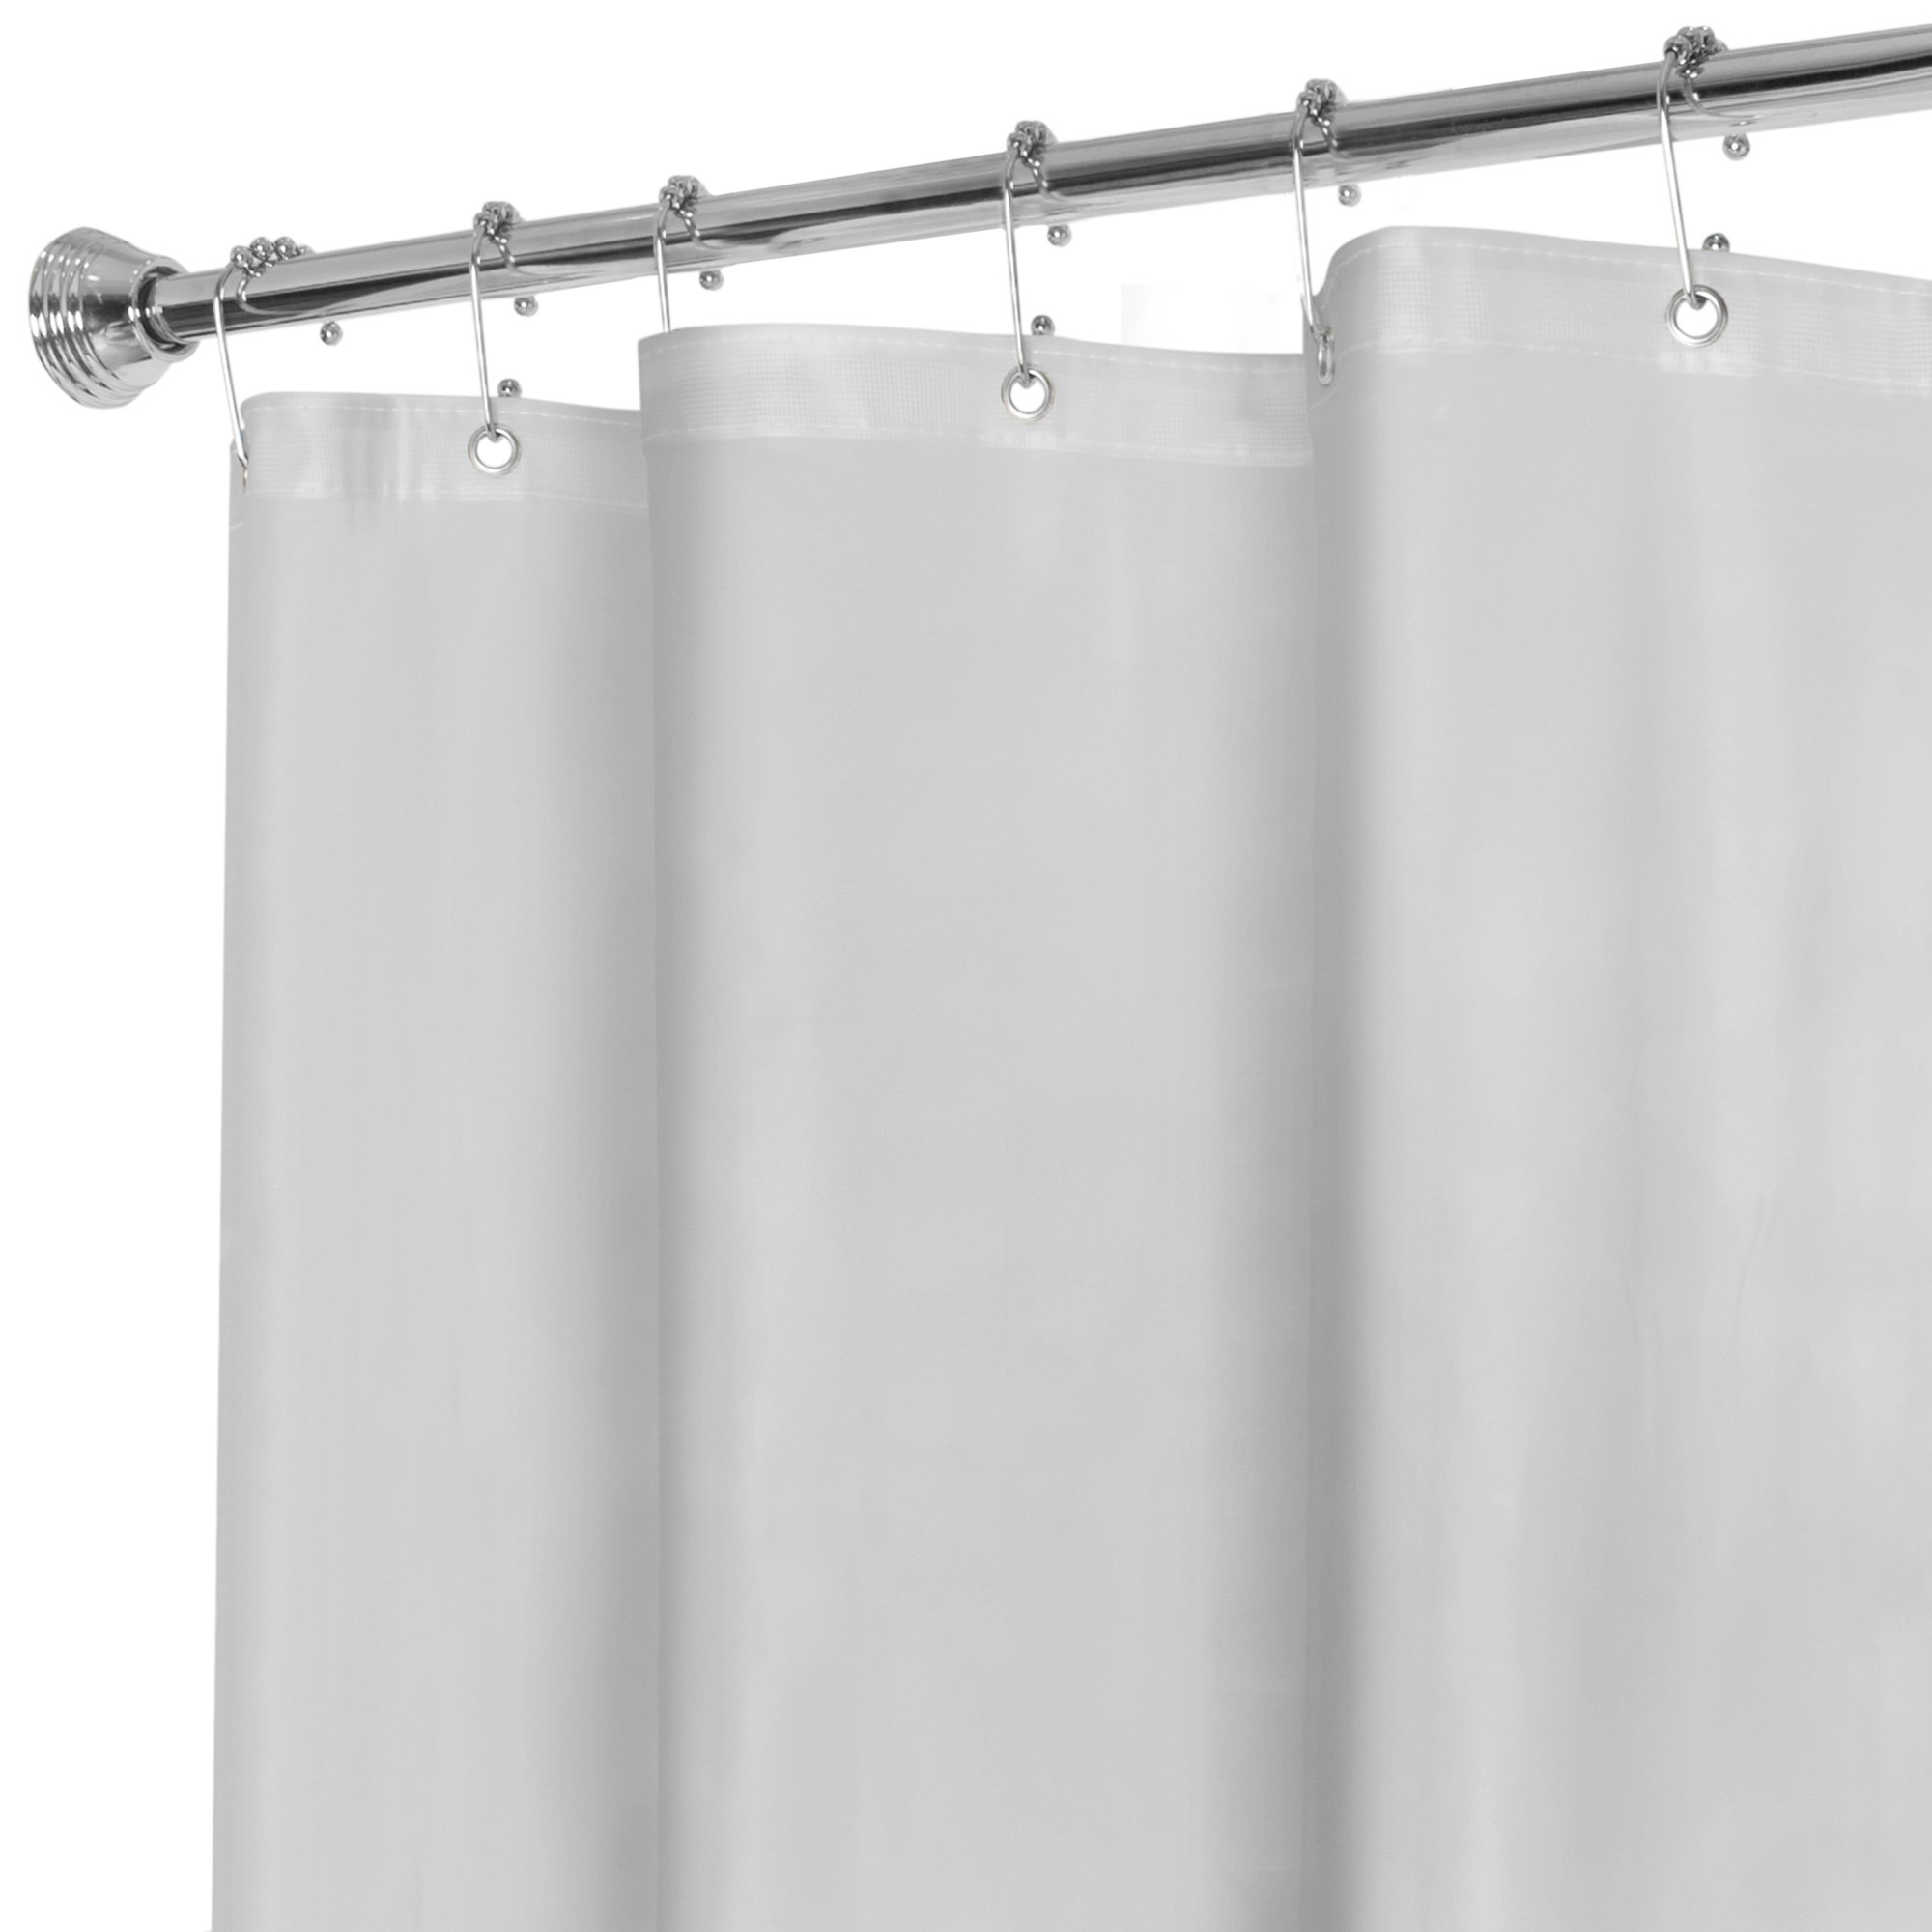 5dc77c84ac1fcb MAYTEX Super Heavyweight Premium 10 Gauge Shower Curtain Liner with  Rustproof Metal Grommets